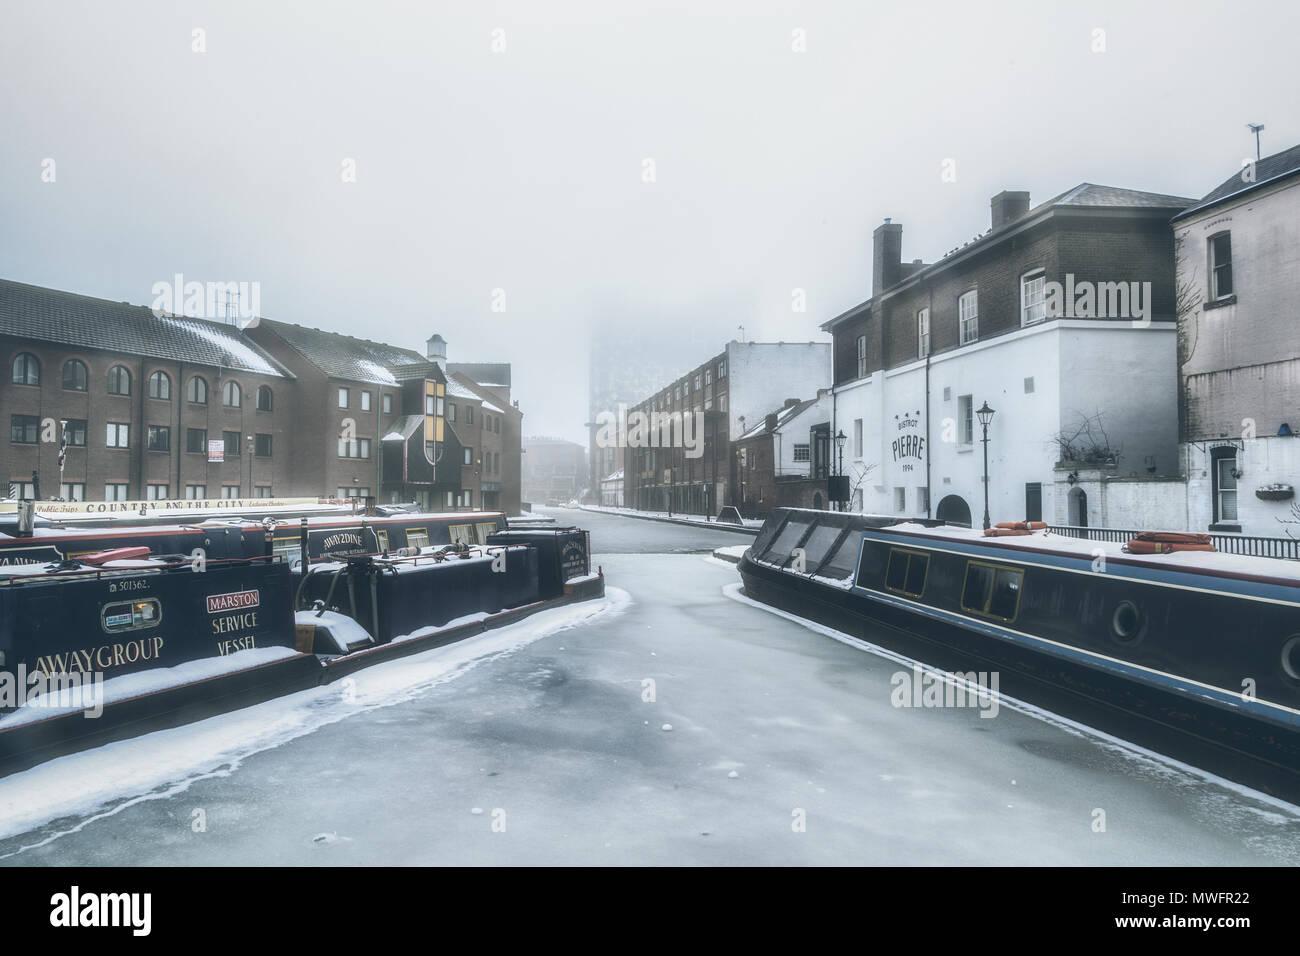 Winter in Gas Street Basin, Birmingham - Stock Image